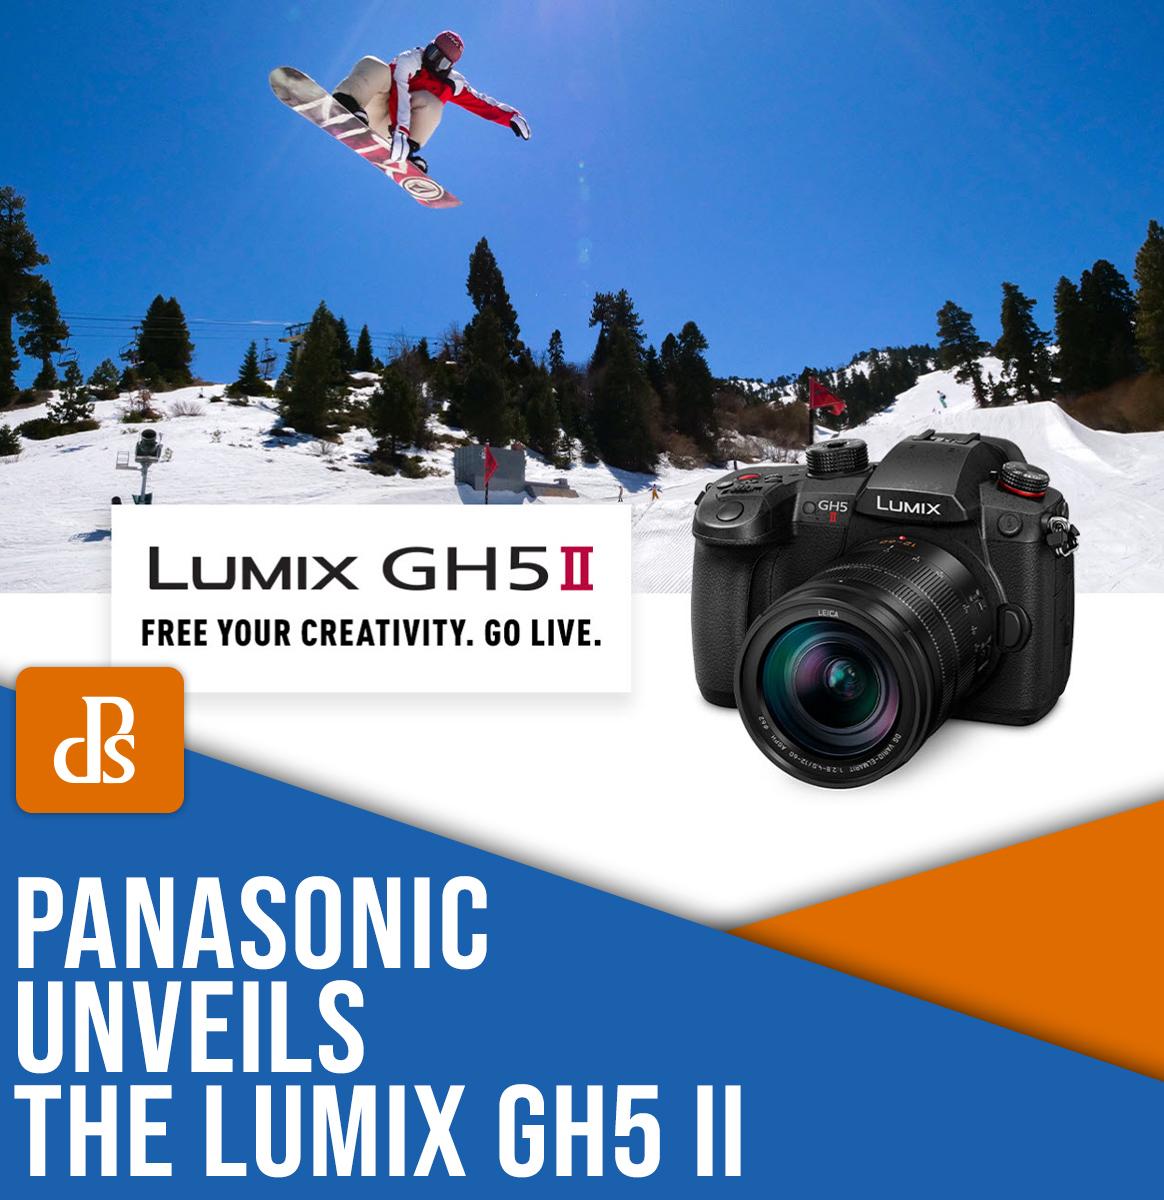 Panasonic Lumix GH5 II released